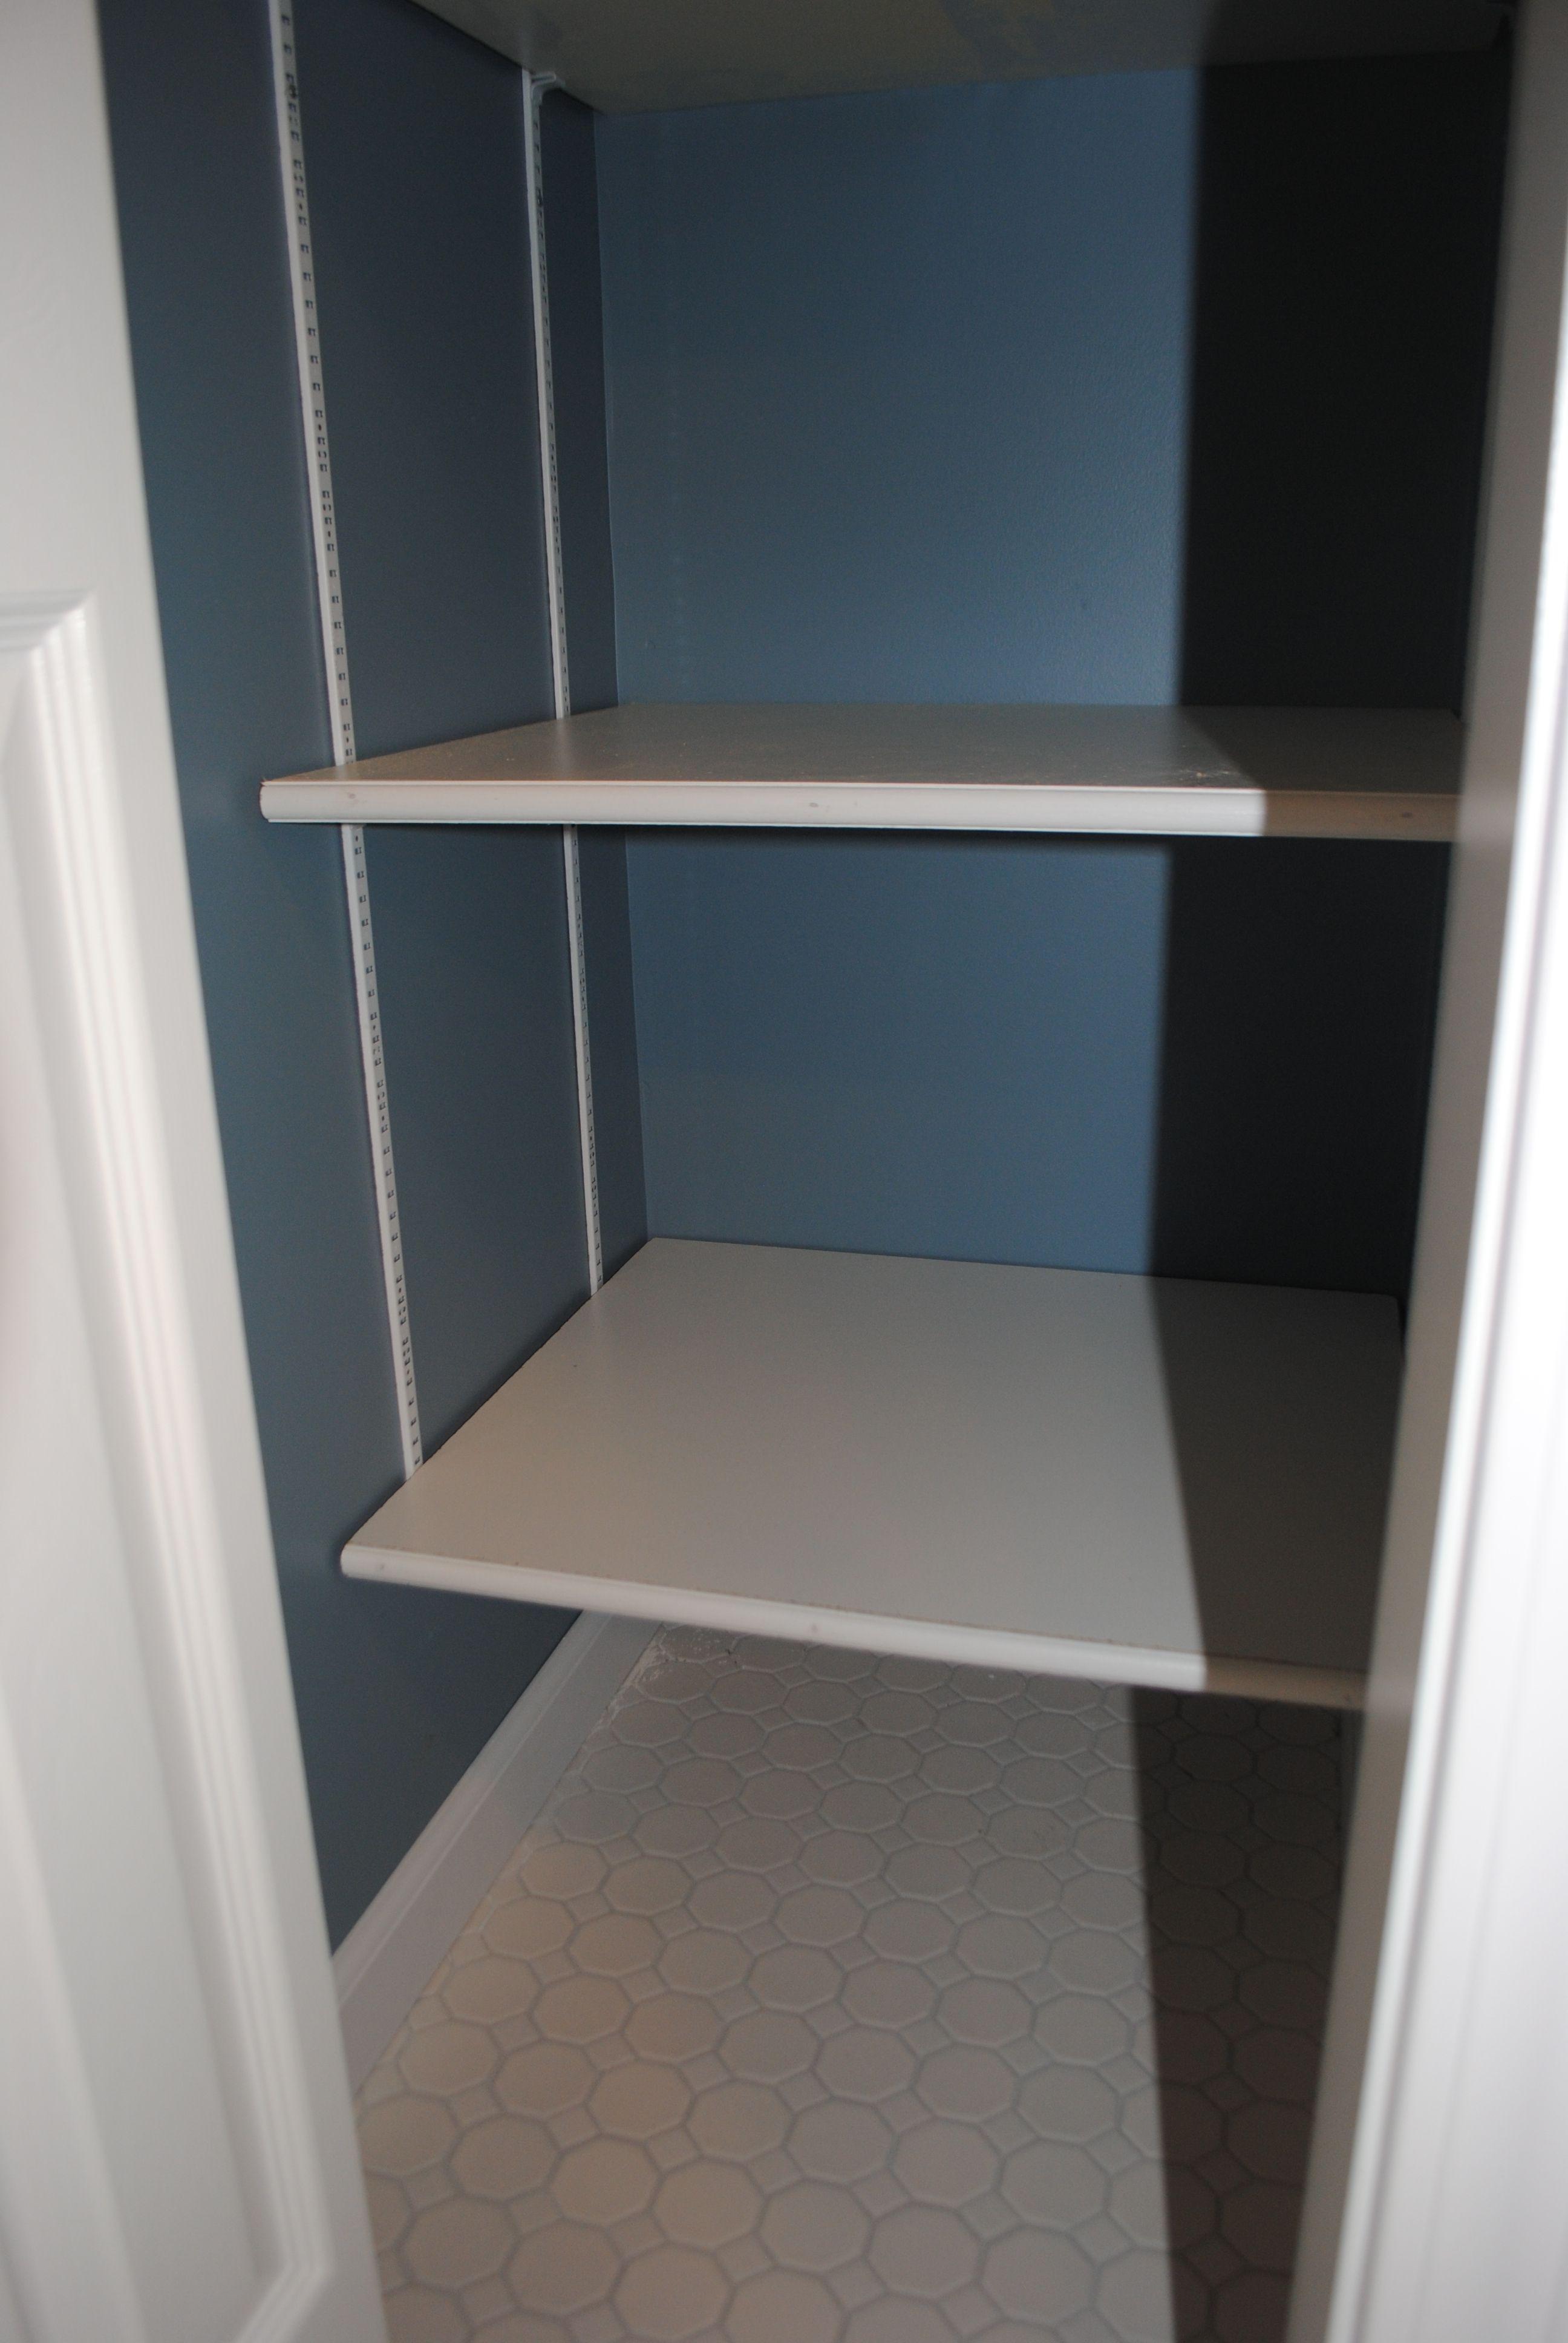 Adjustable Melamine Coated Closet Shelving In A Bathroom Linen Closet Linen Closet Shelves Closet Shelves Shelves